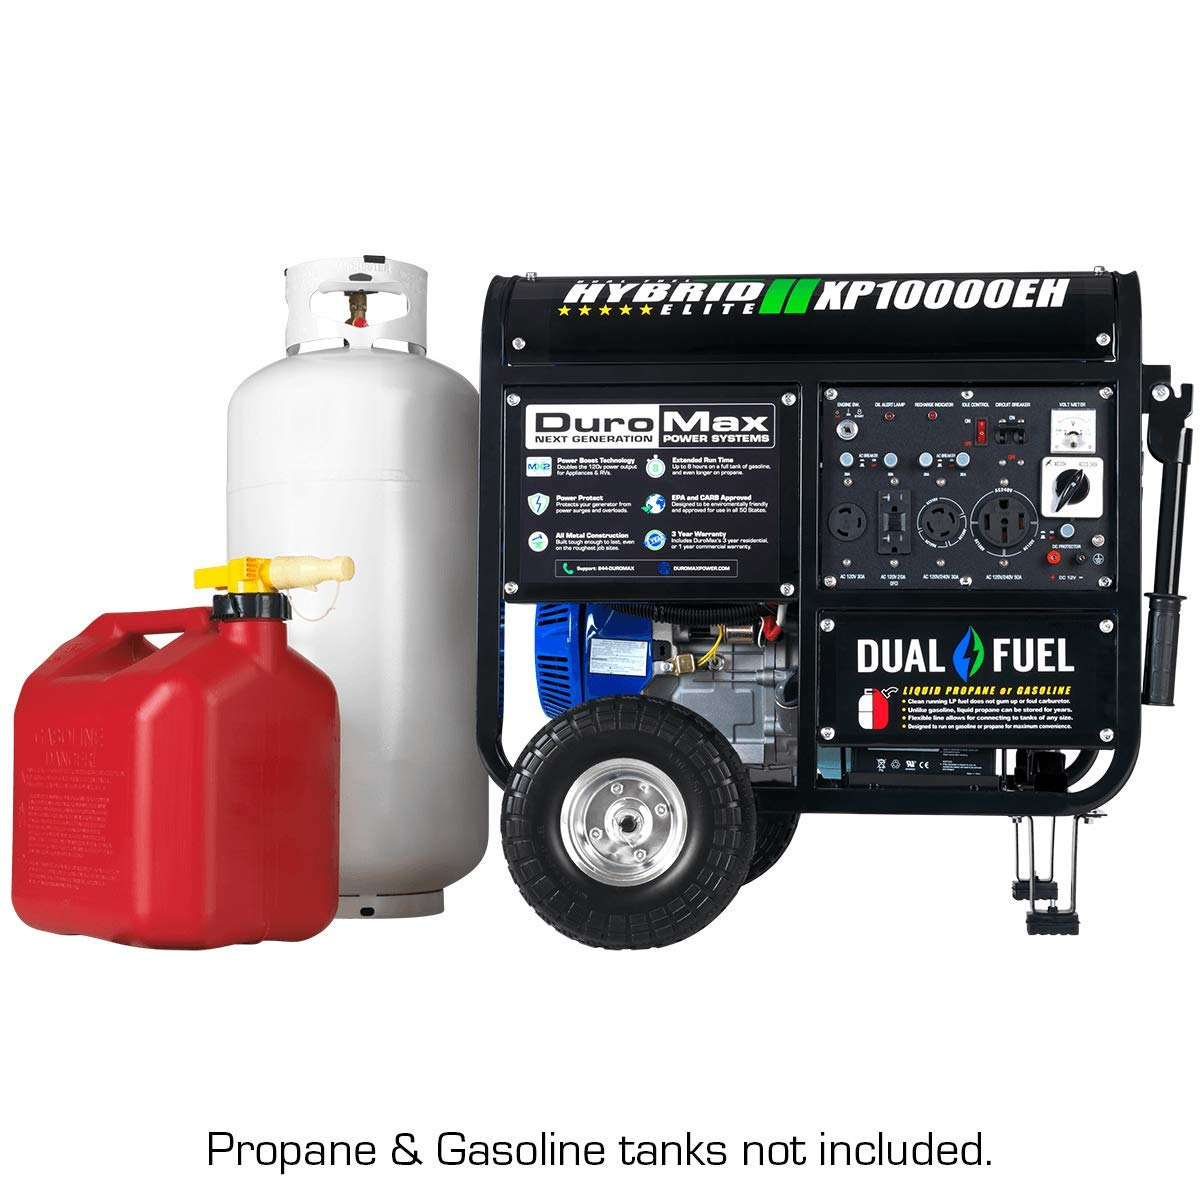 Duromax XP10000EH 10000 Watt Dual Fuel Hybrid Generator W Elec. Start on